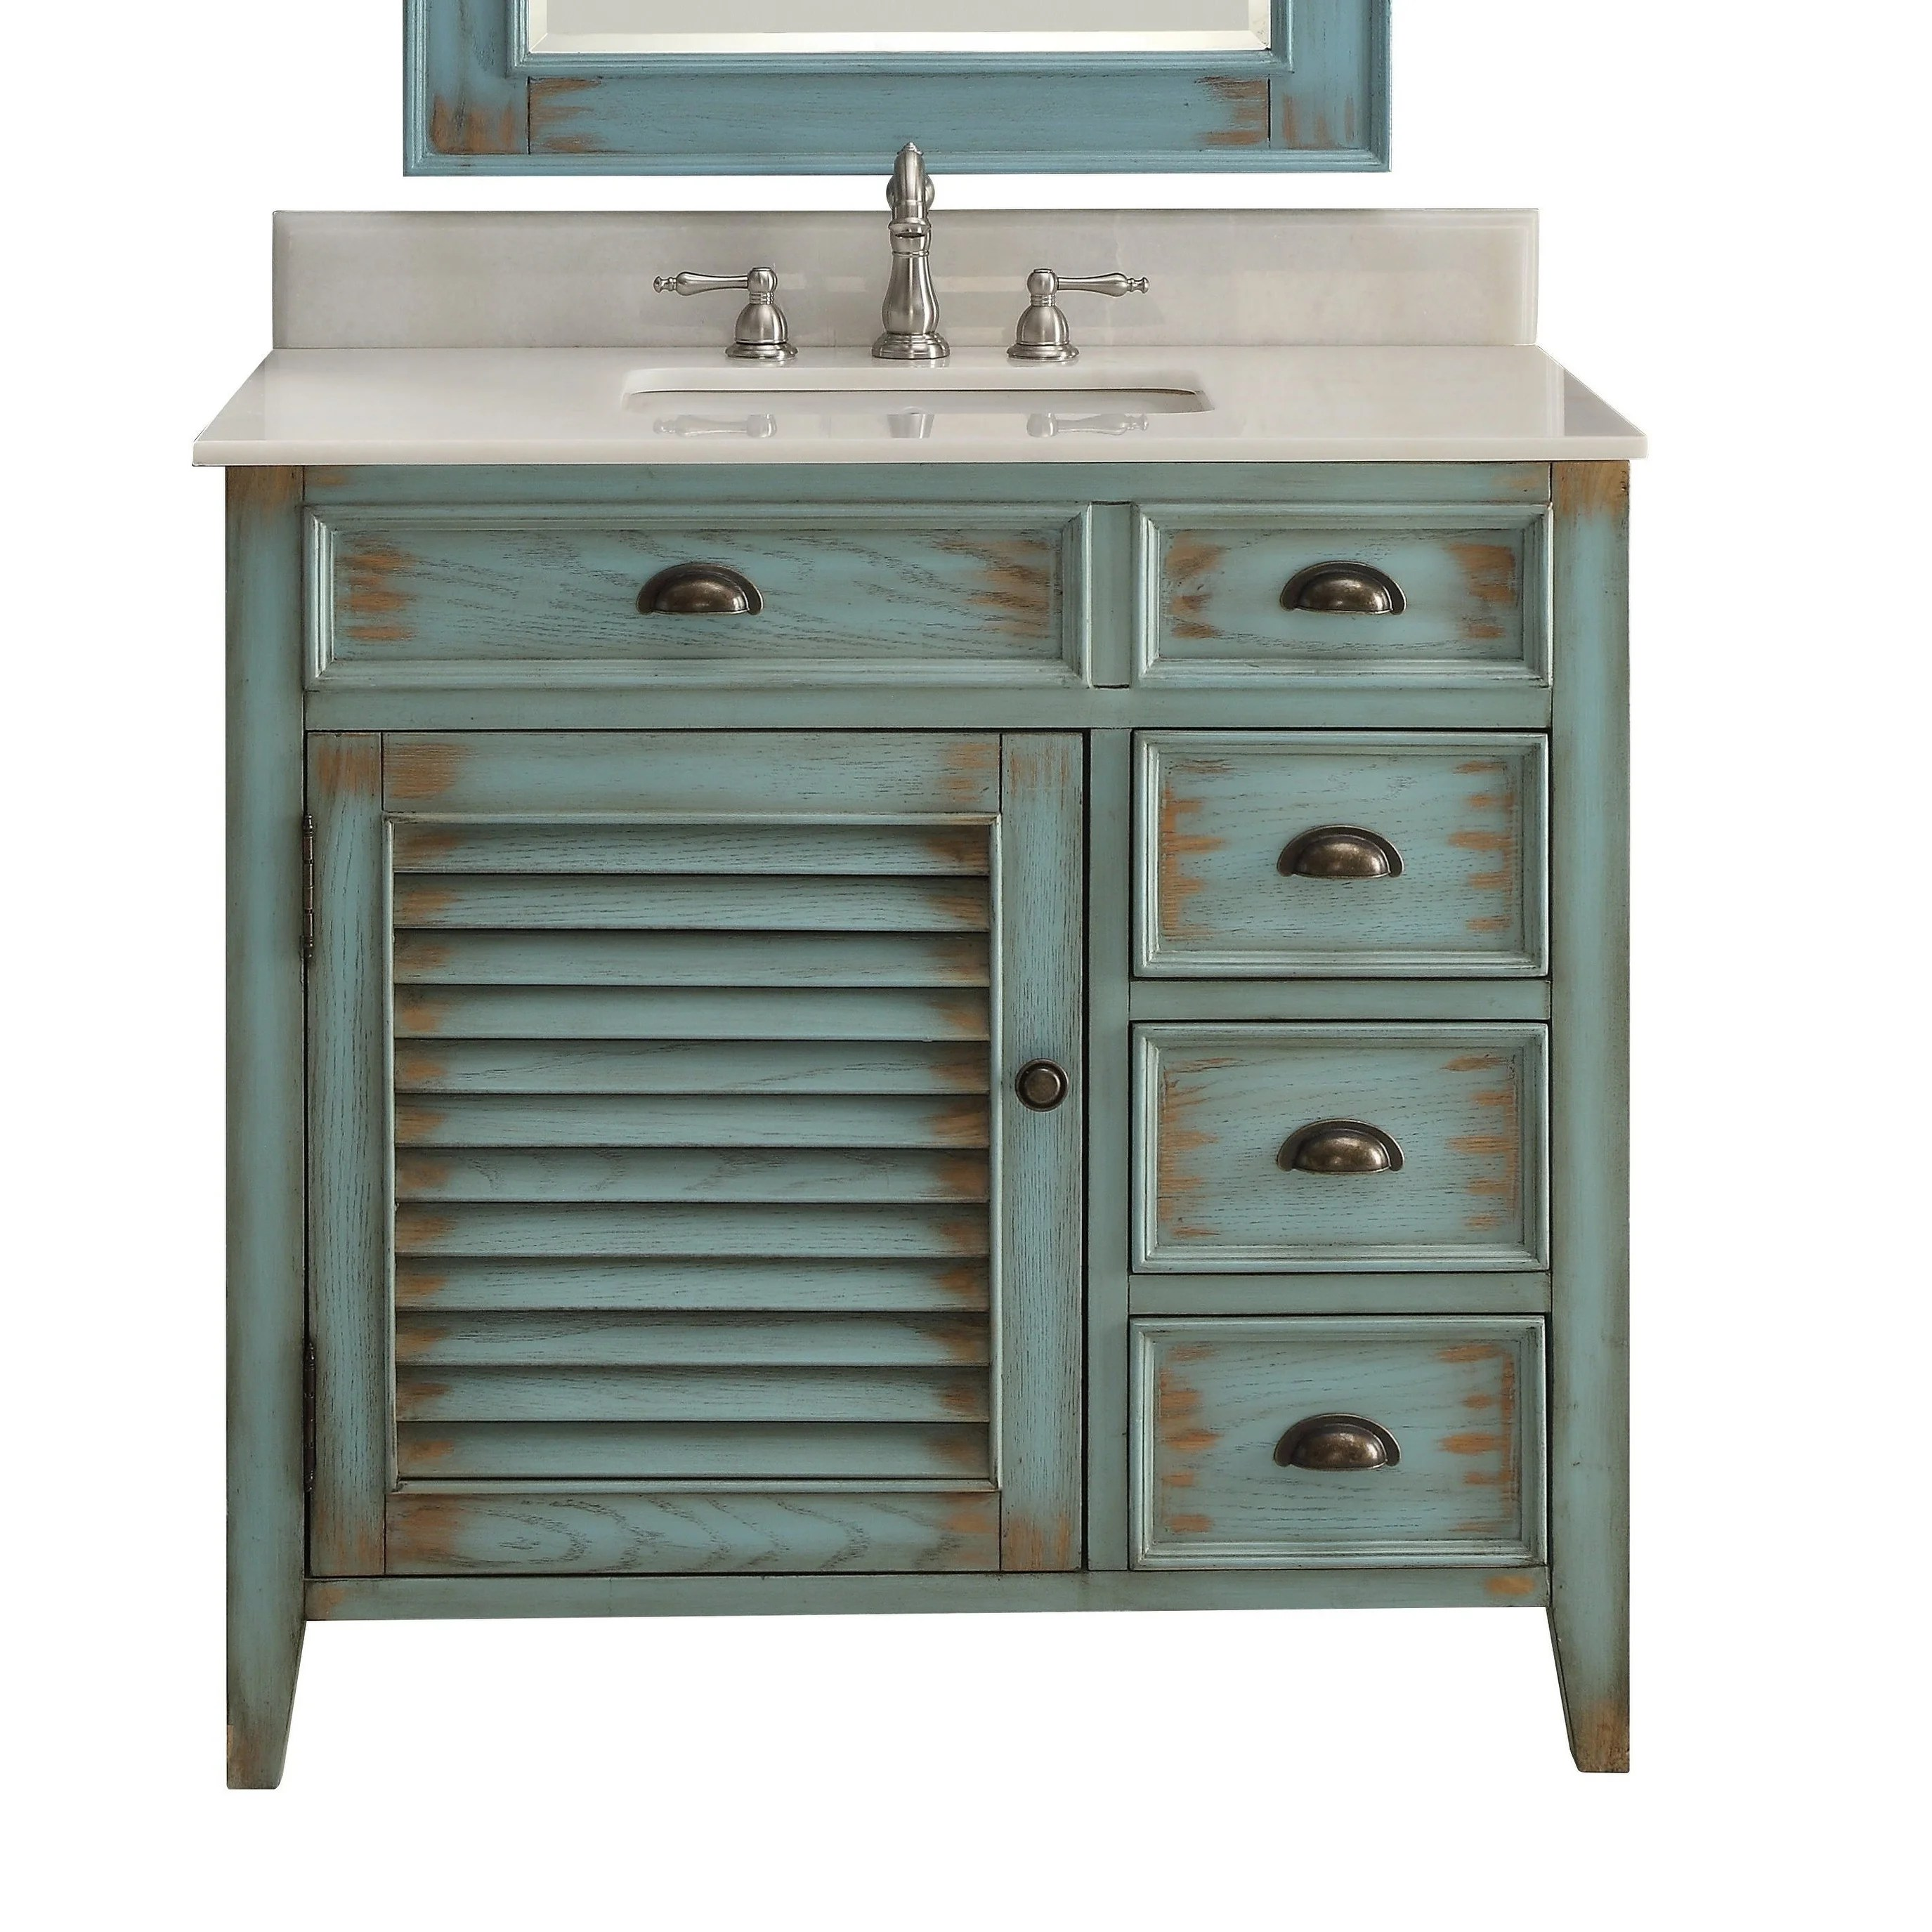 benton collection abbeville 36 inch farmhouse rustic bathroom vanity